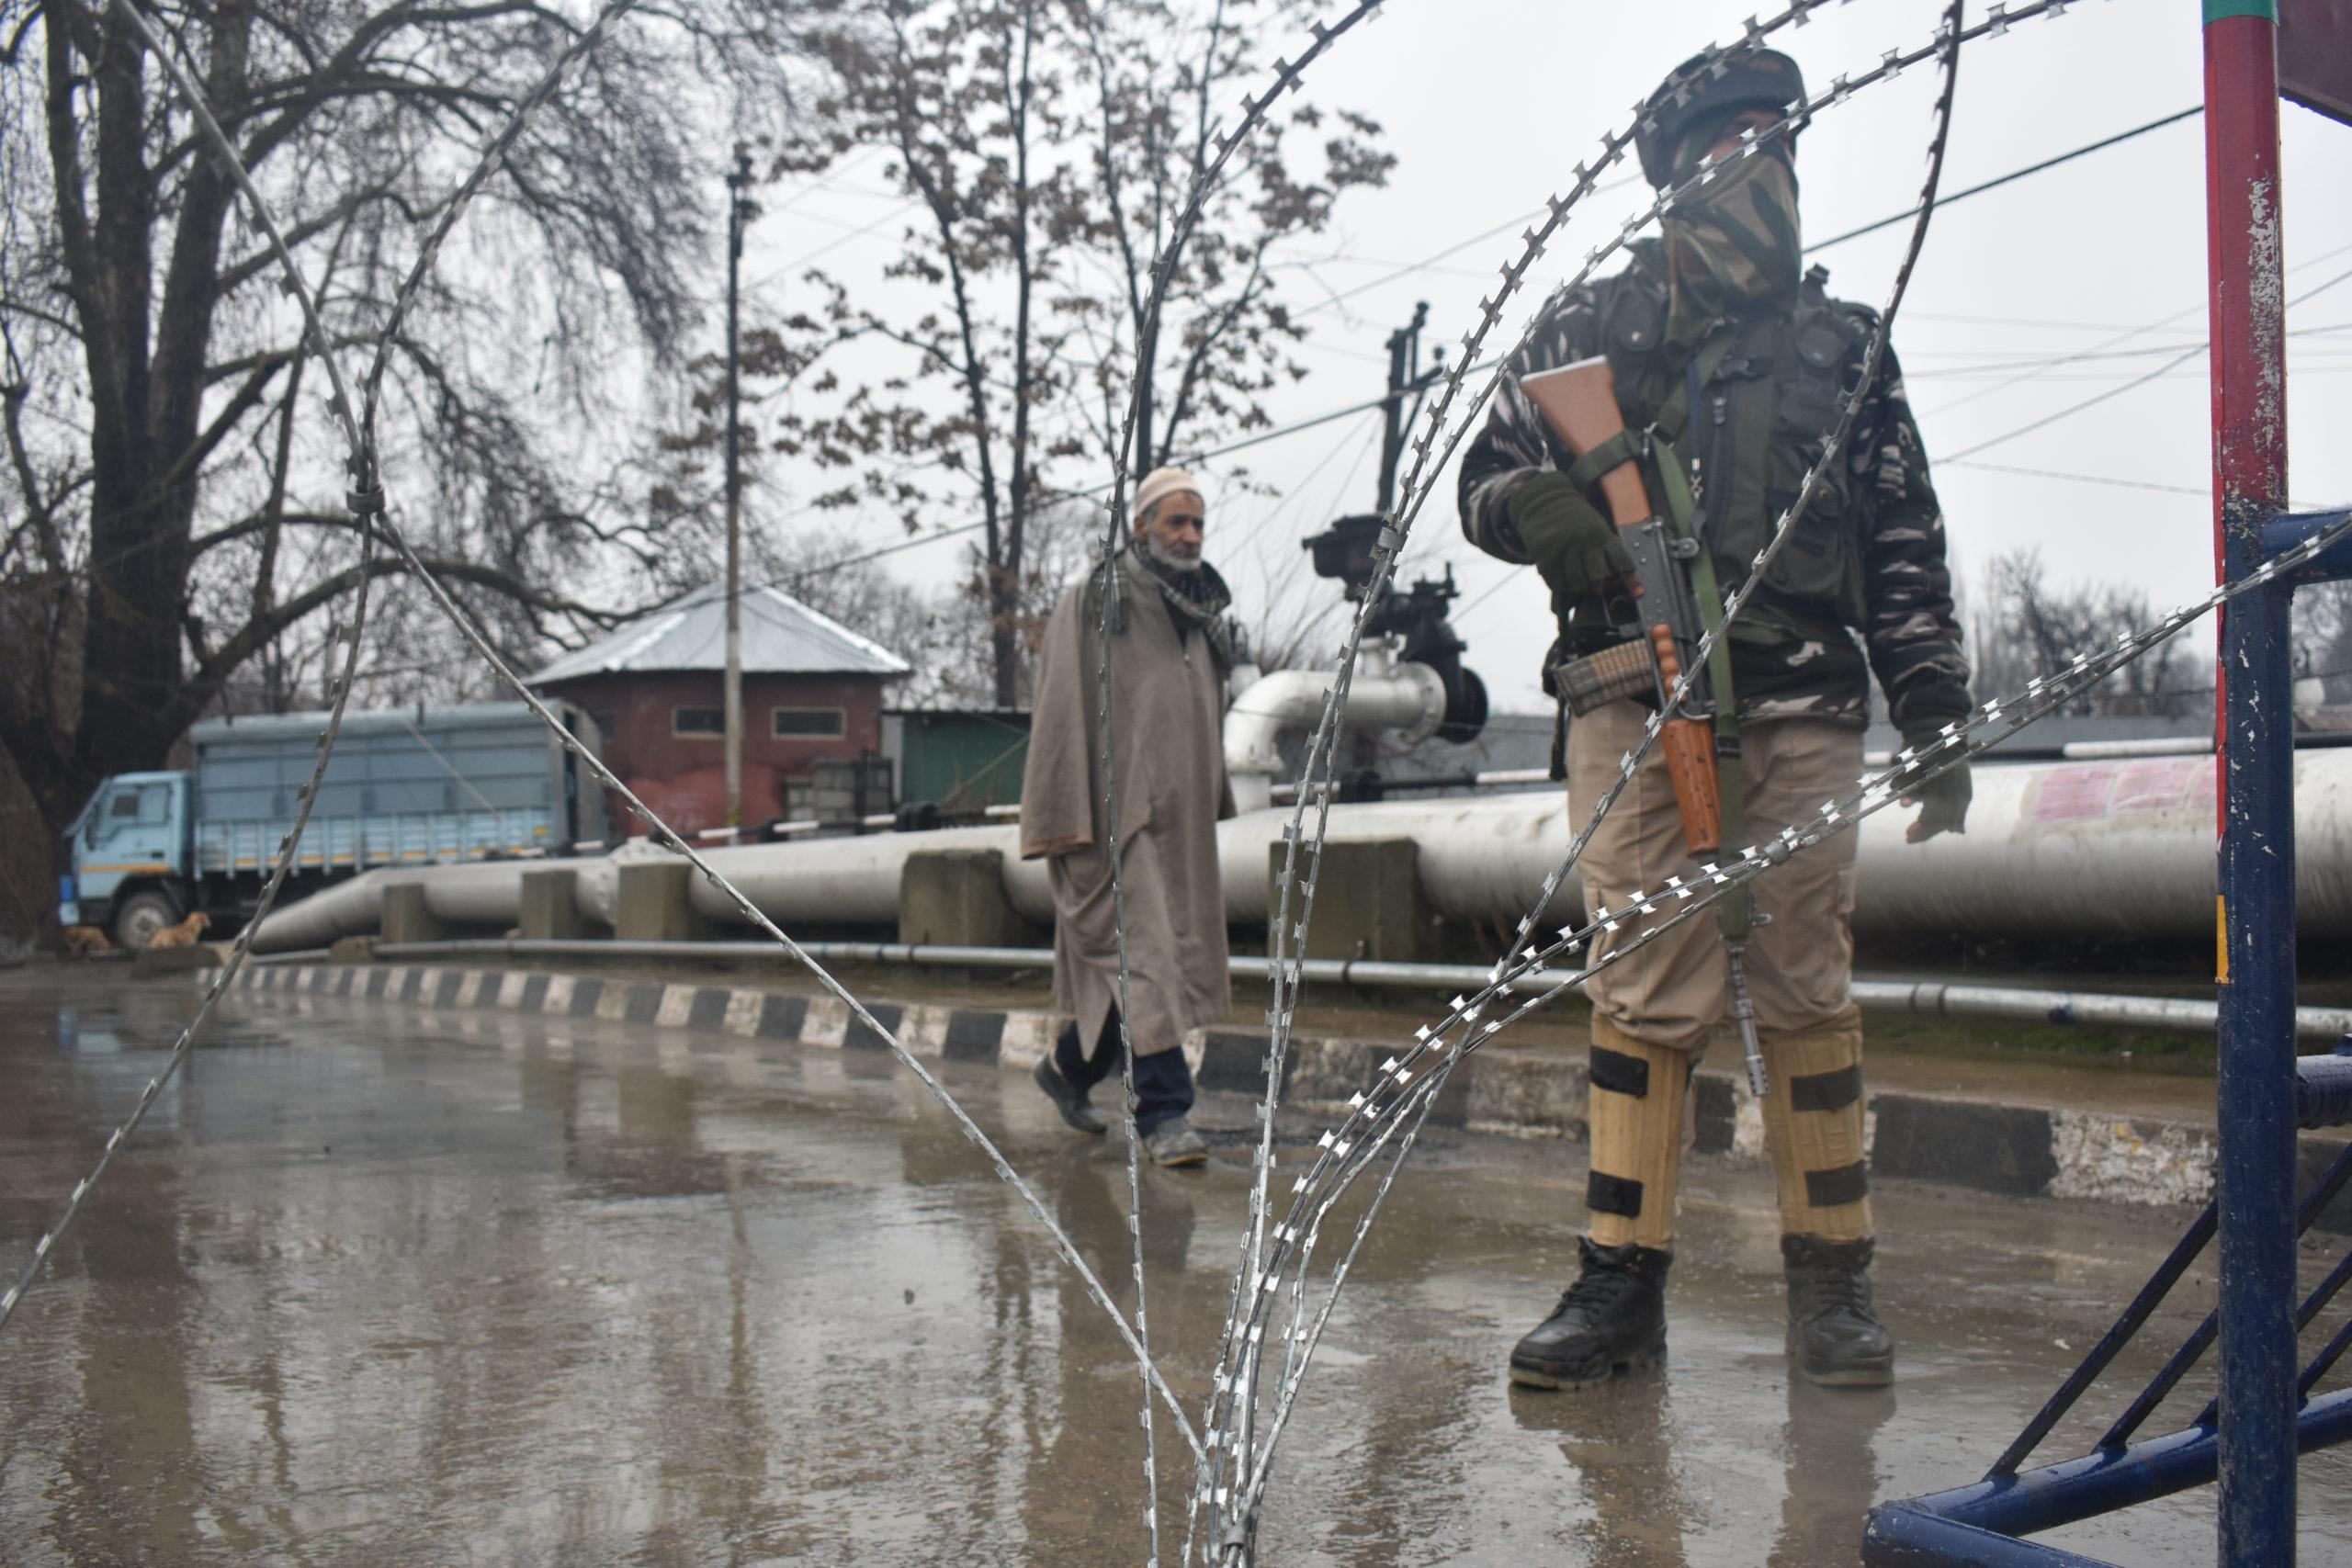 Tungt beväpnad militärpolis i Srinagar, Kashmir 2019.